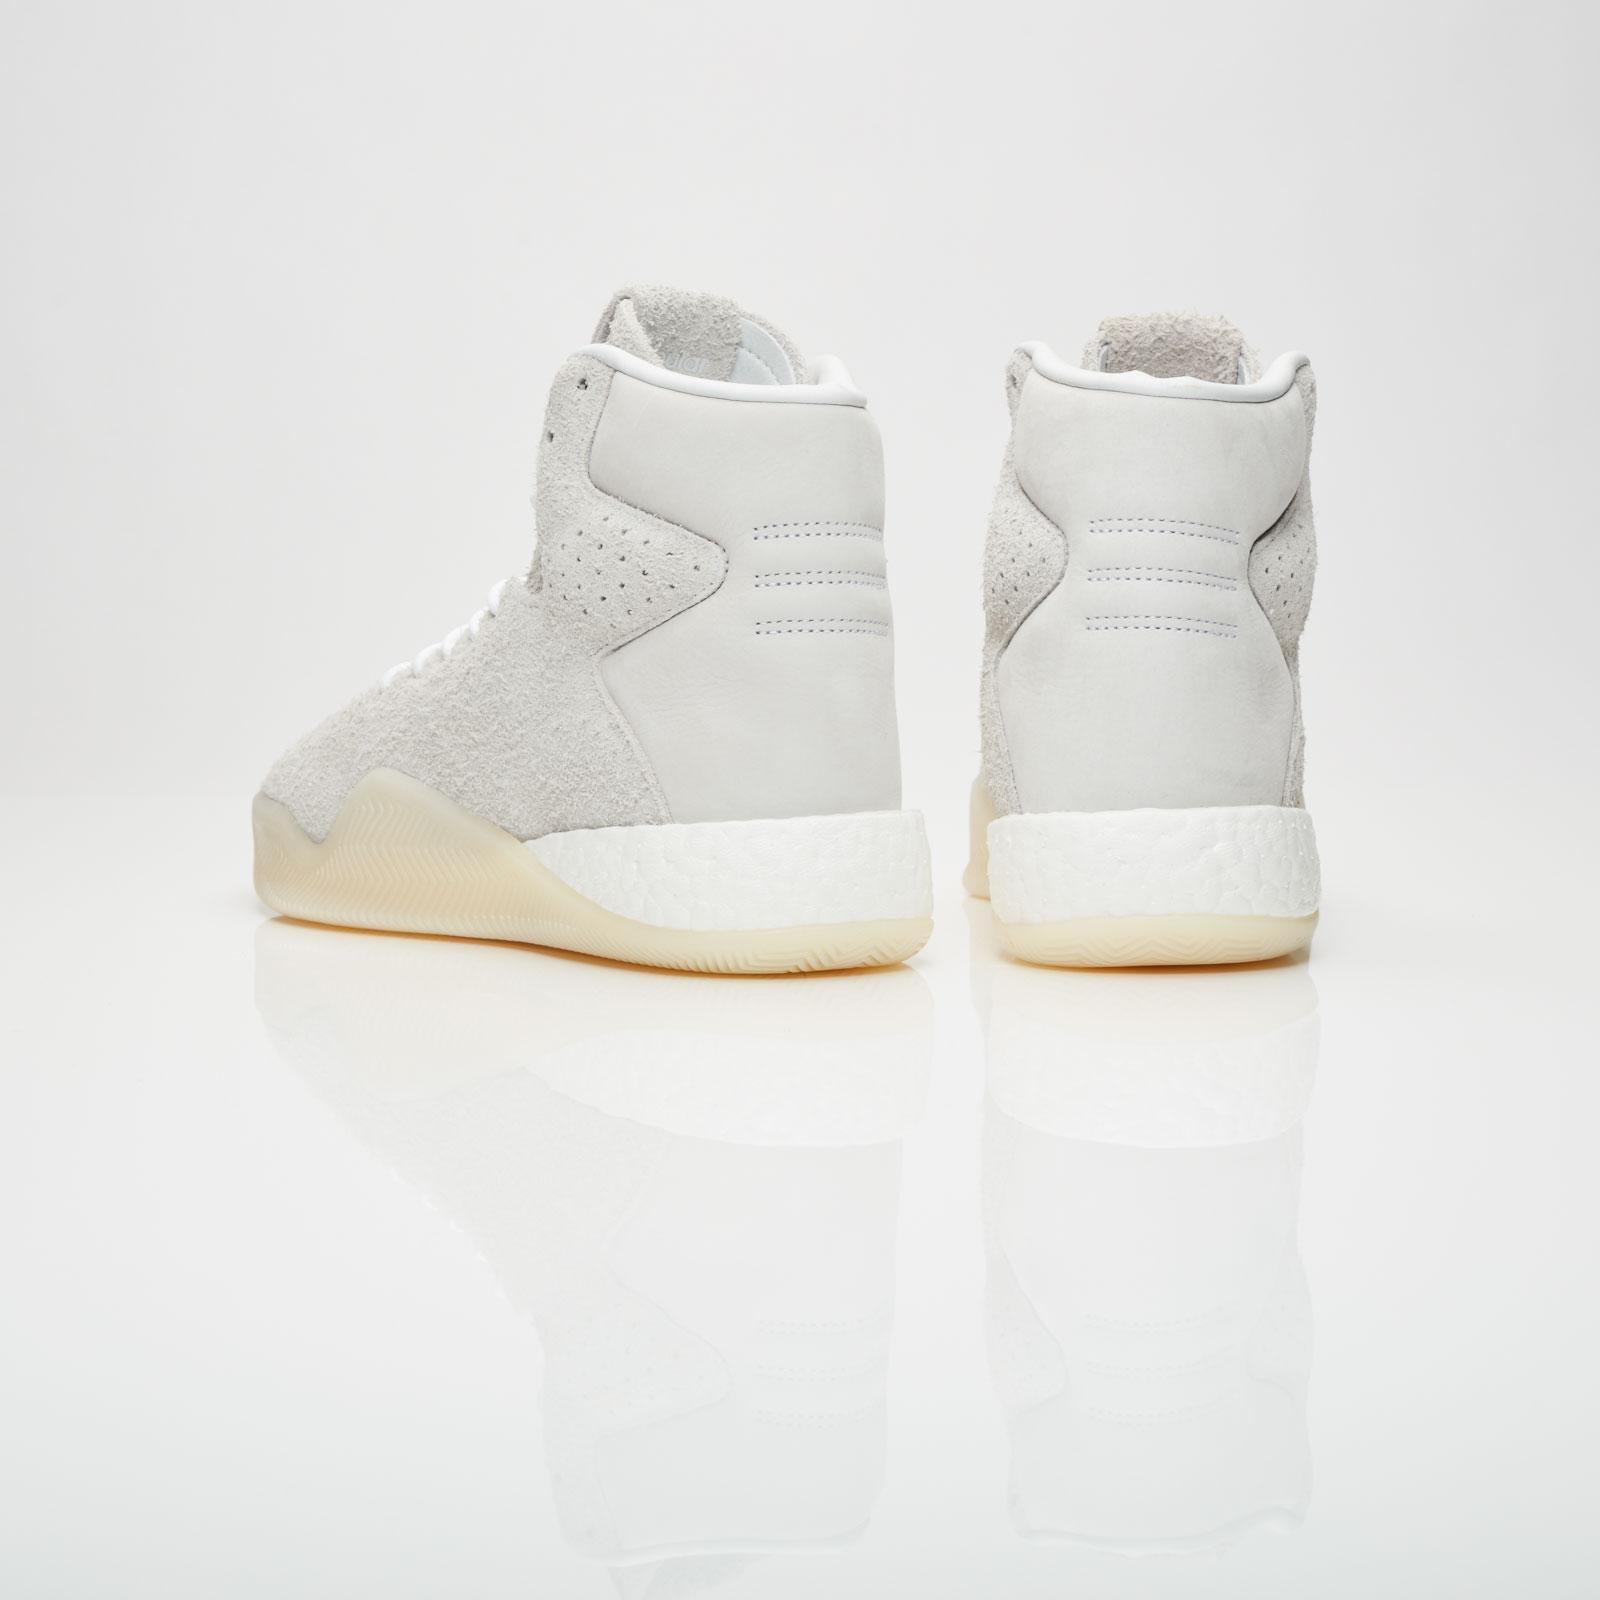 new styles 4d95b 33427 adidas Tubular Instinct - Bb8947 - Sneakersnstuff | sneakers ...